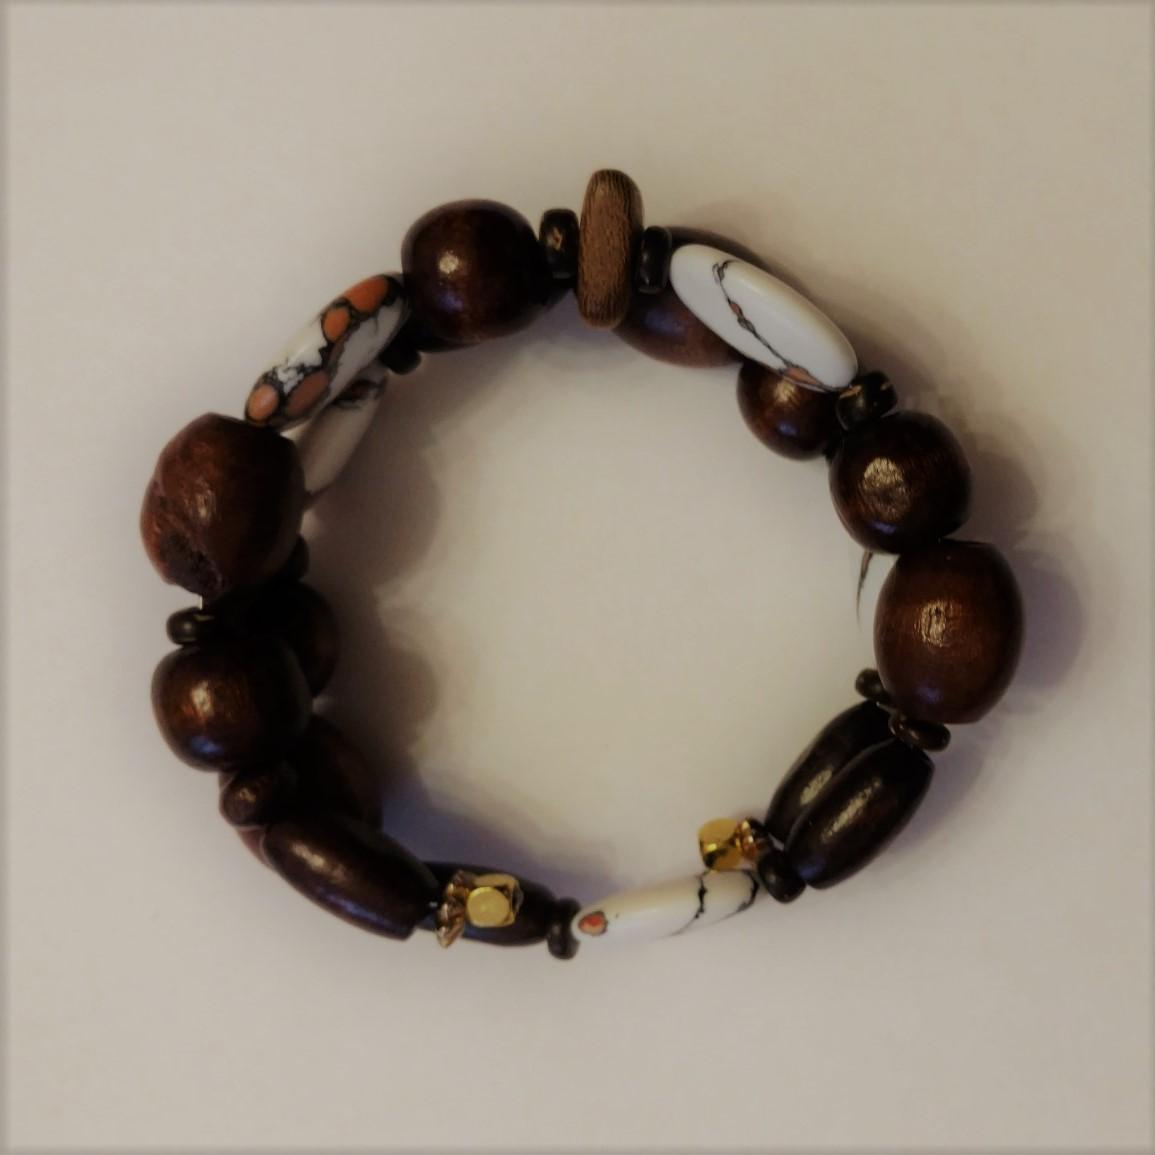 #L&L 181202 Bracelet  Suggested $10 USD